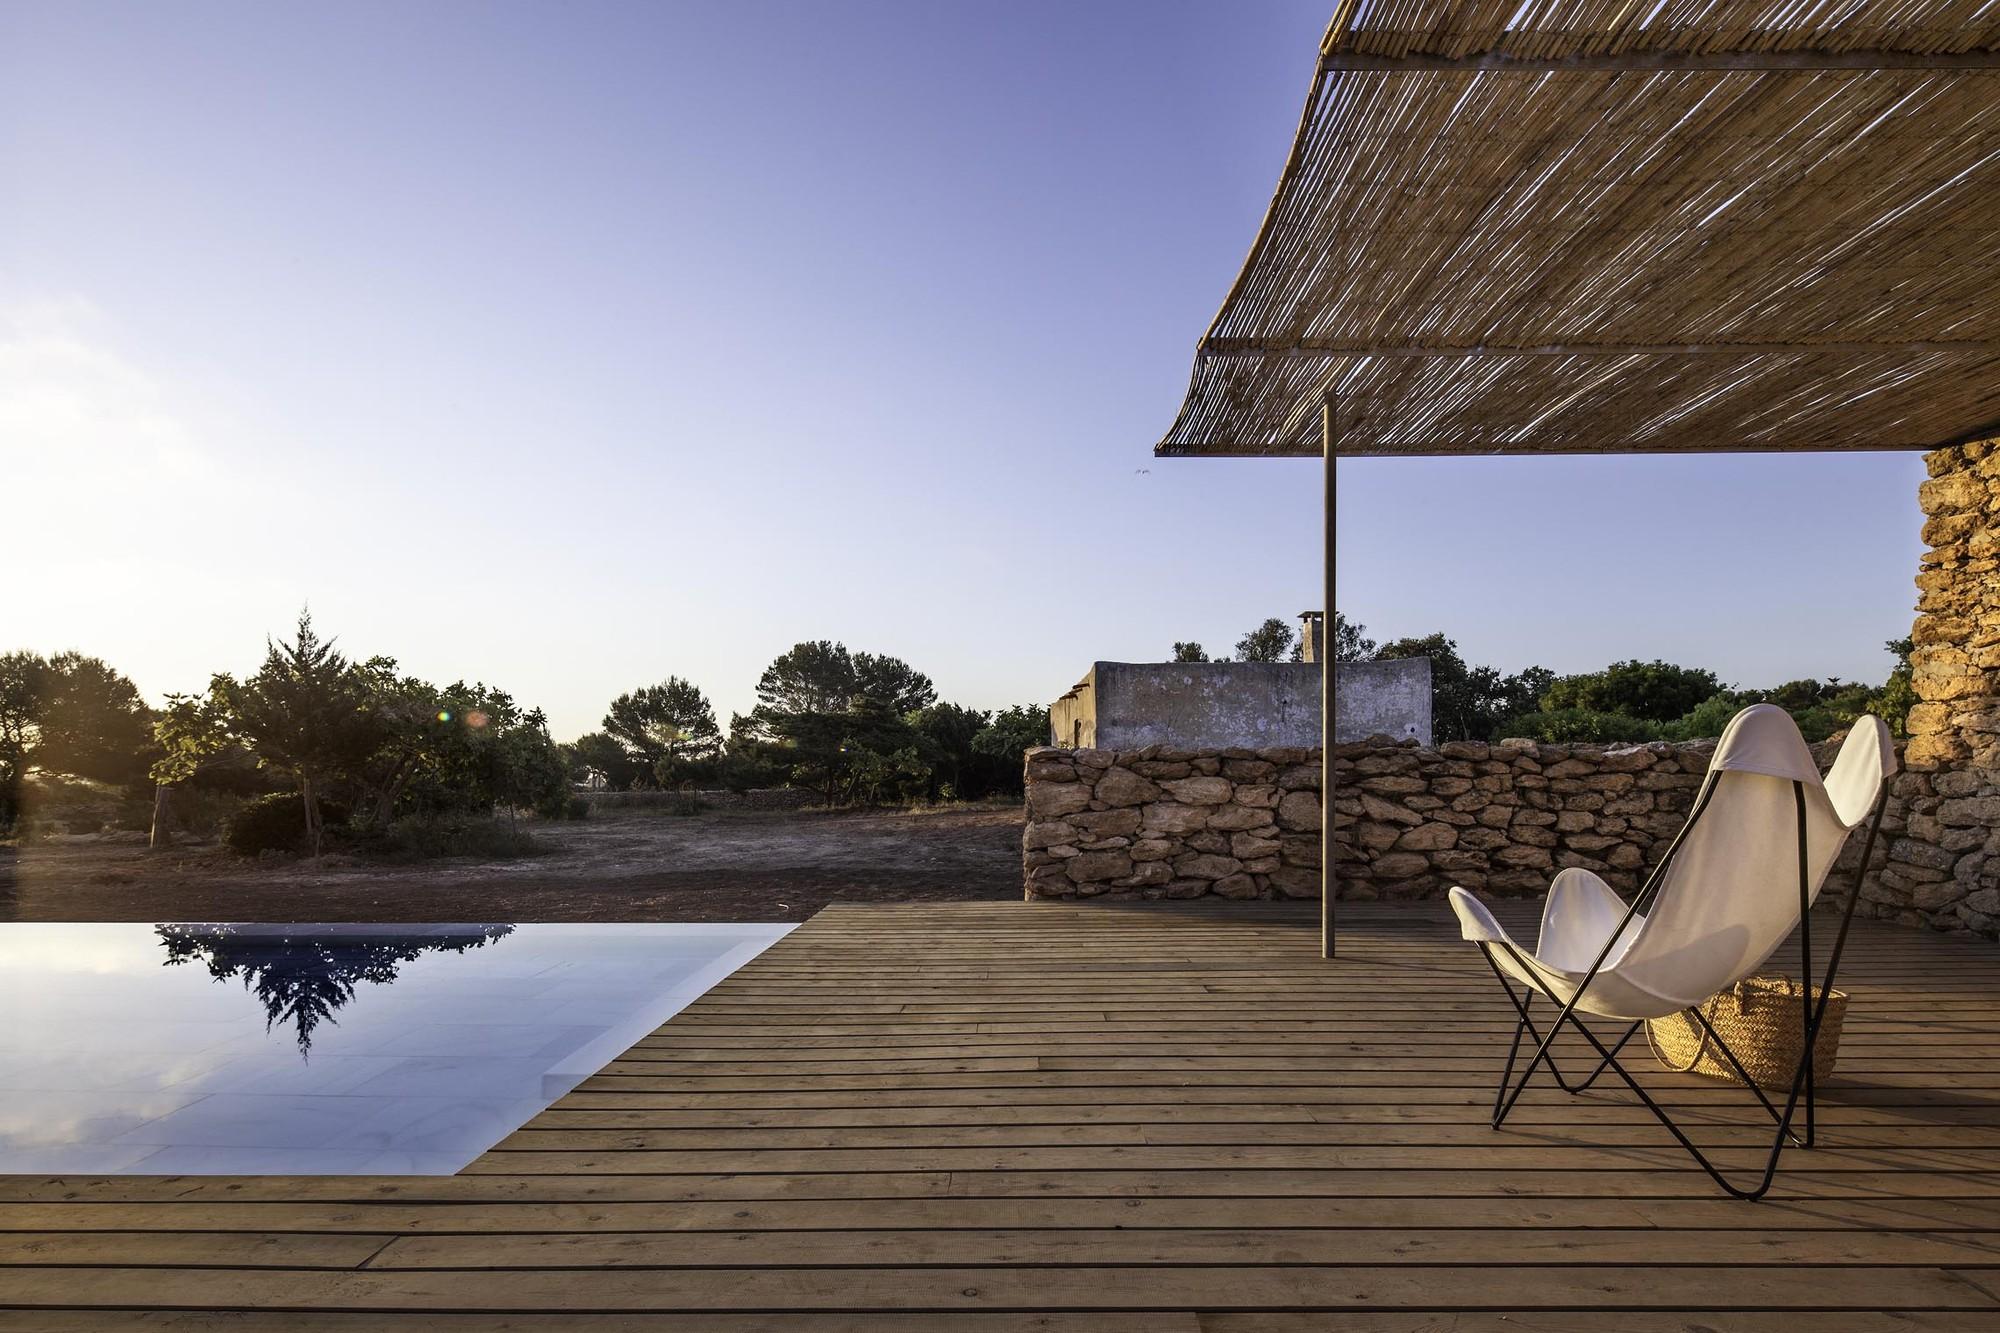 Galer a de arquitectura y paisaje piscina en formentera for Piscina walker martinez